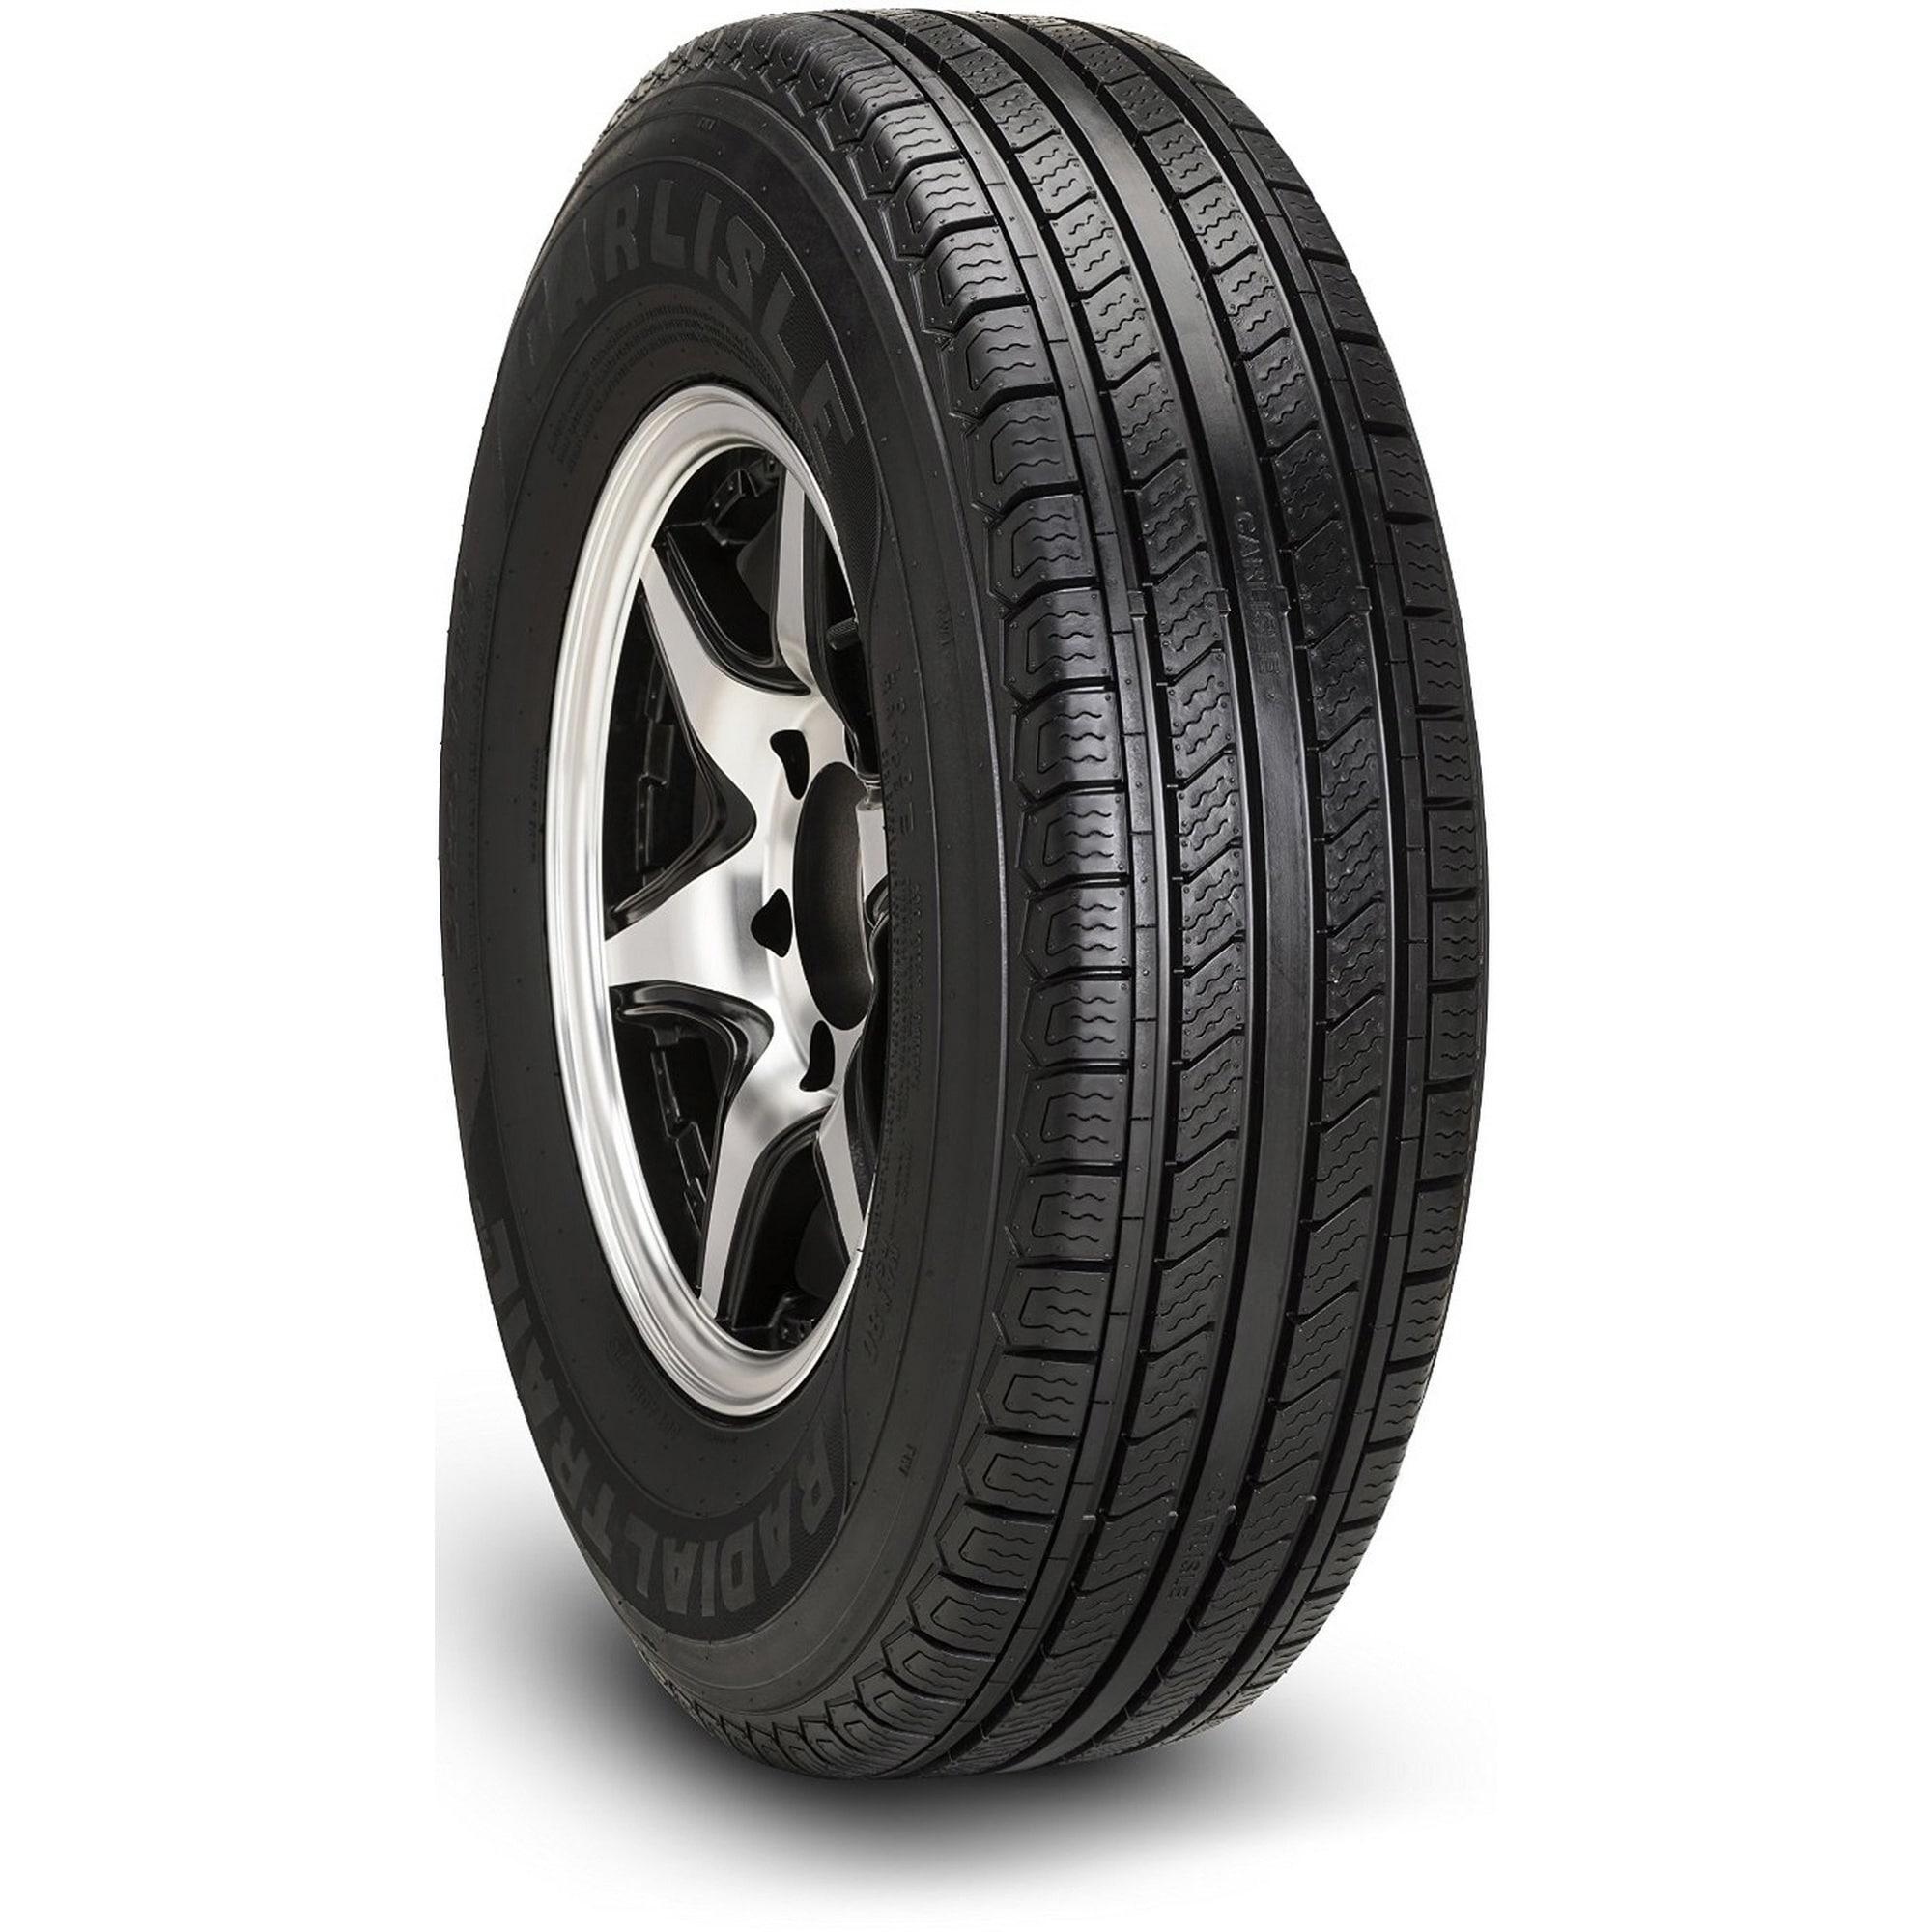 Carlisle Radial Trail HD Trailer Tire - ST235/85R16 LRF/1...